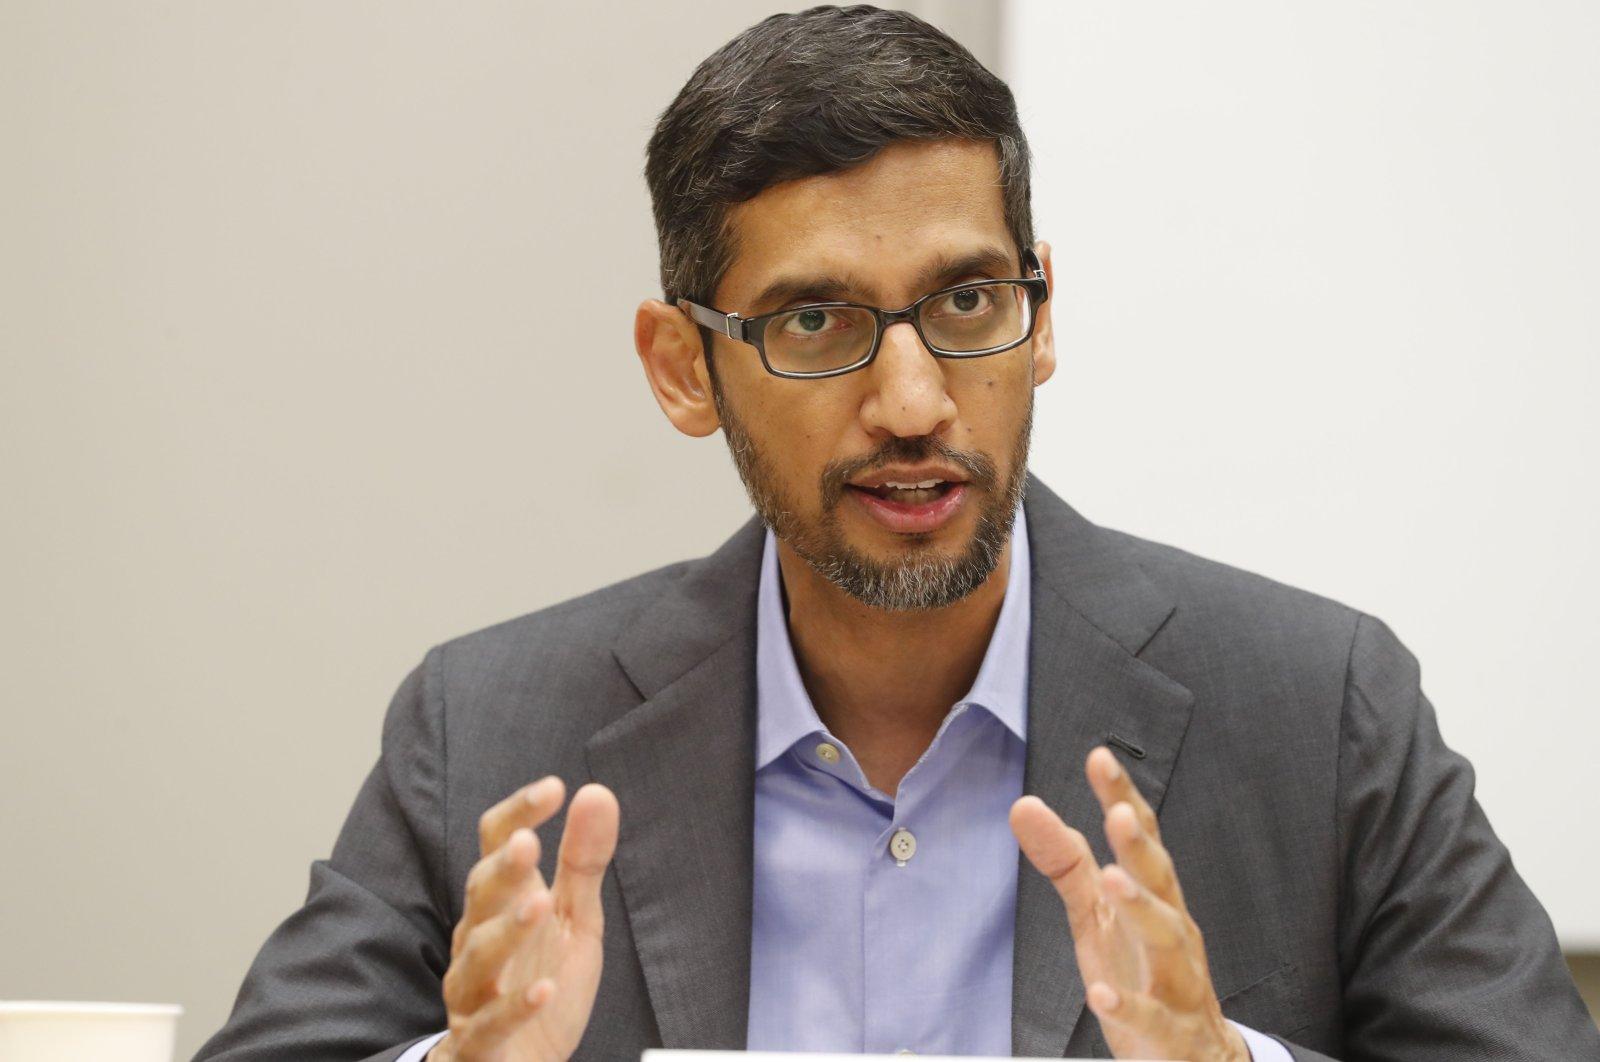 Google CEO Sundar Pichai speaks during a visit to El Centro College in Dallas, Texas, Oct. 13, 2019. (AP Photo)